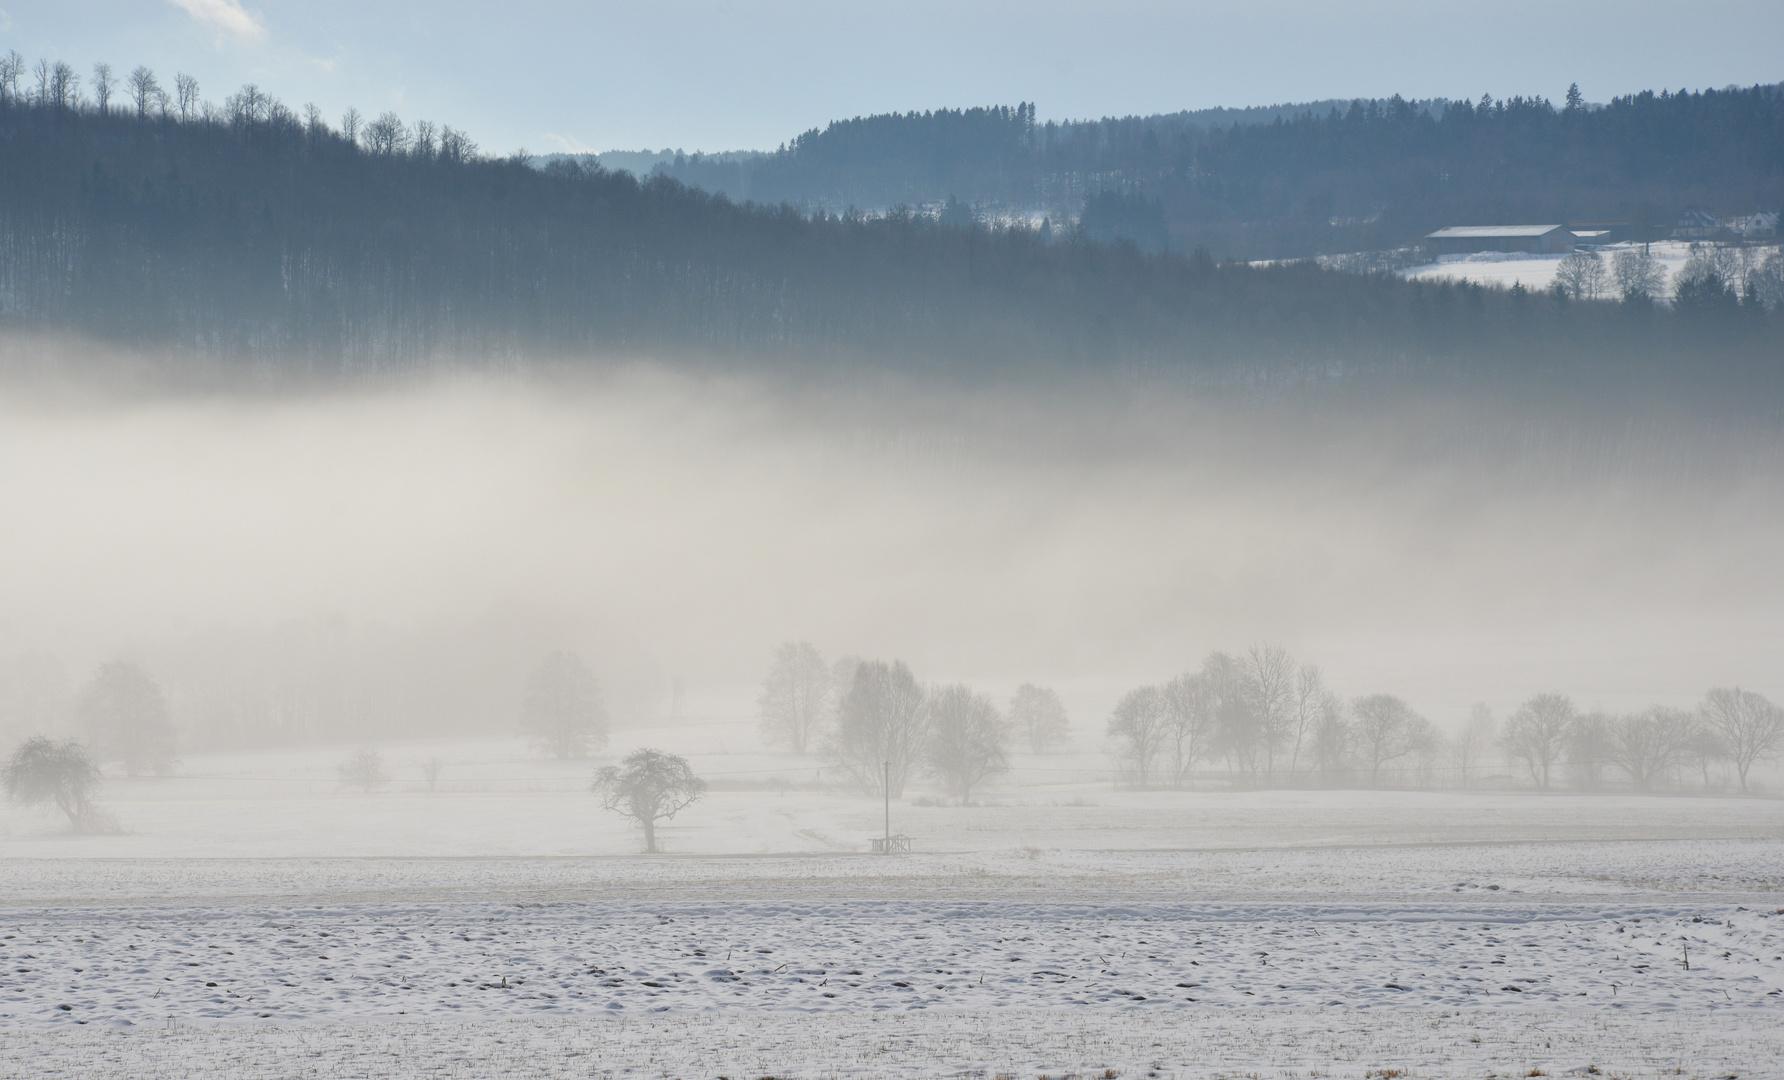 Nebel und Kälte